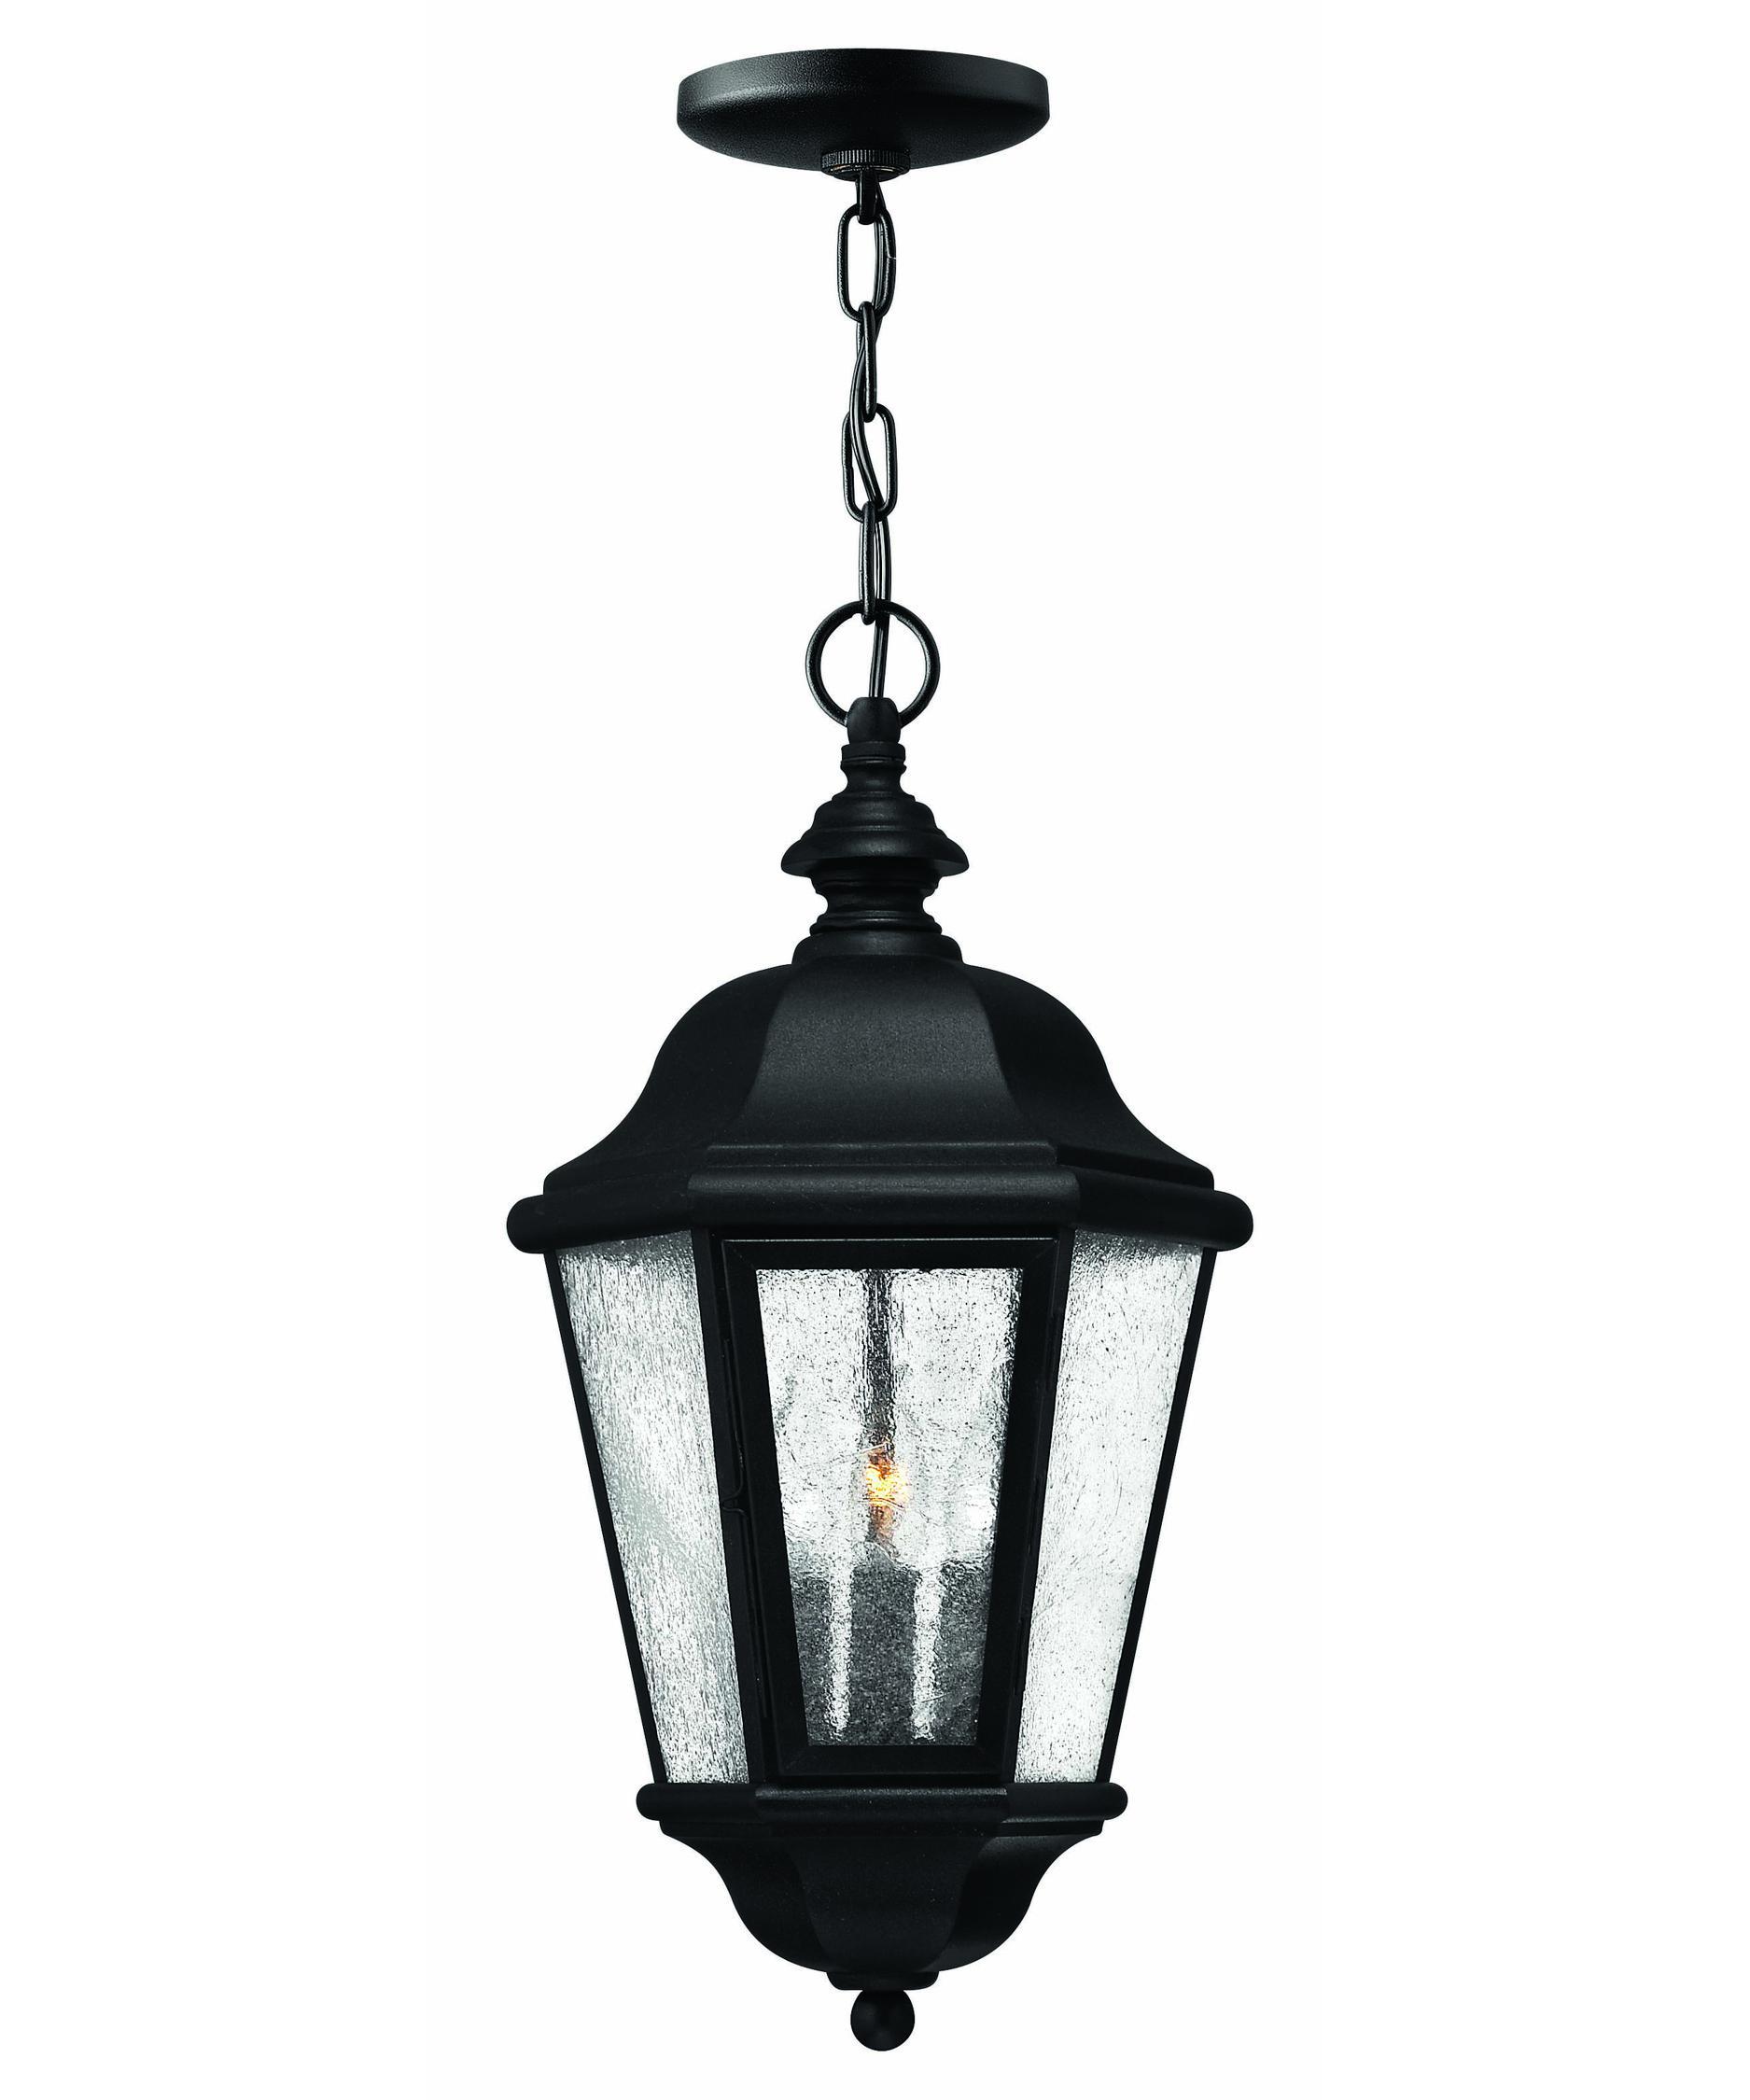 Hinkley lighting 1672 edgewater 10 inch wide 3 light outdoor hanging lantern capitol lighting 1 800lighting com